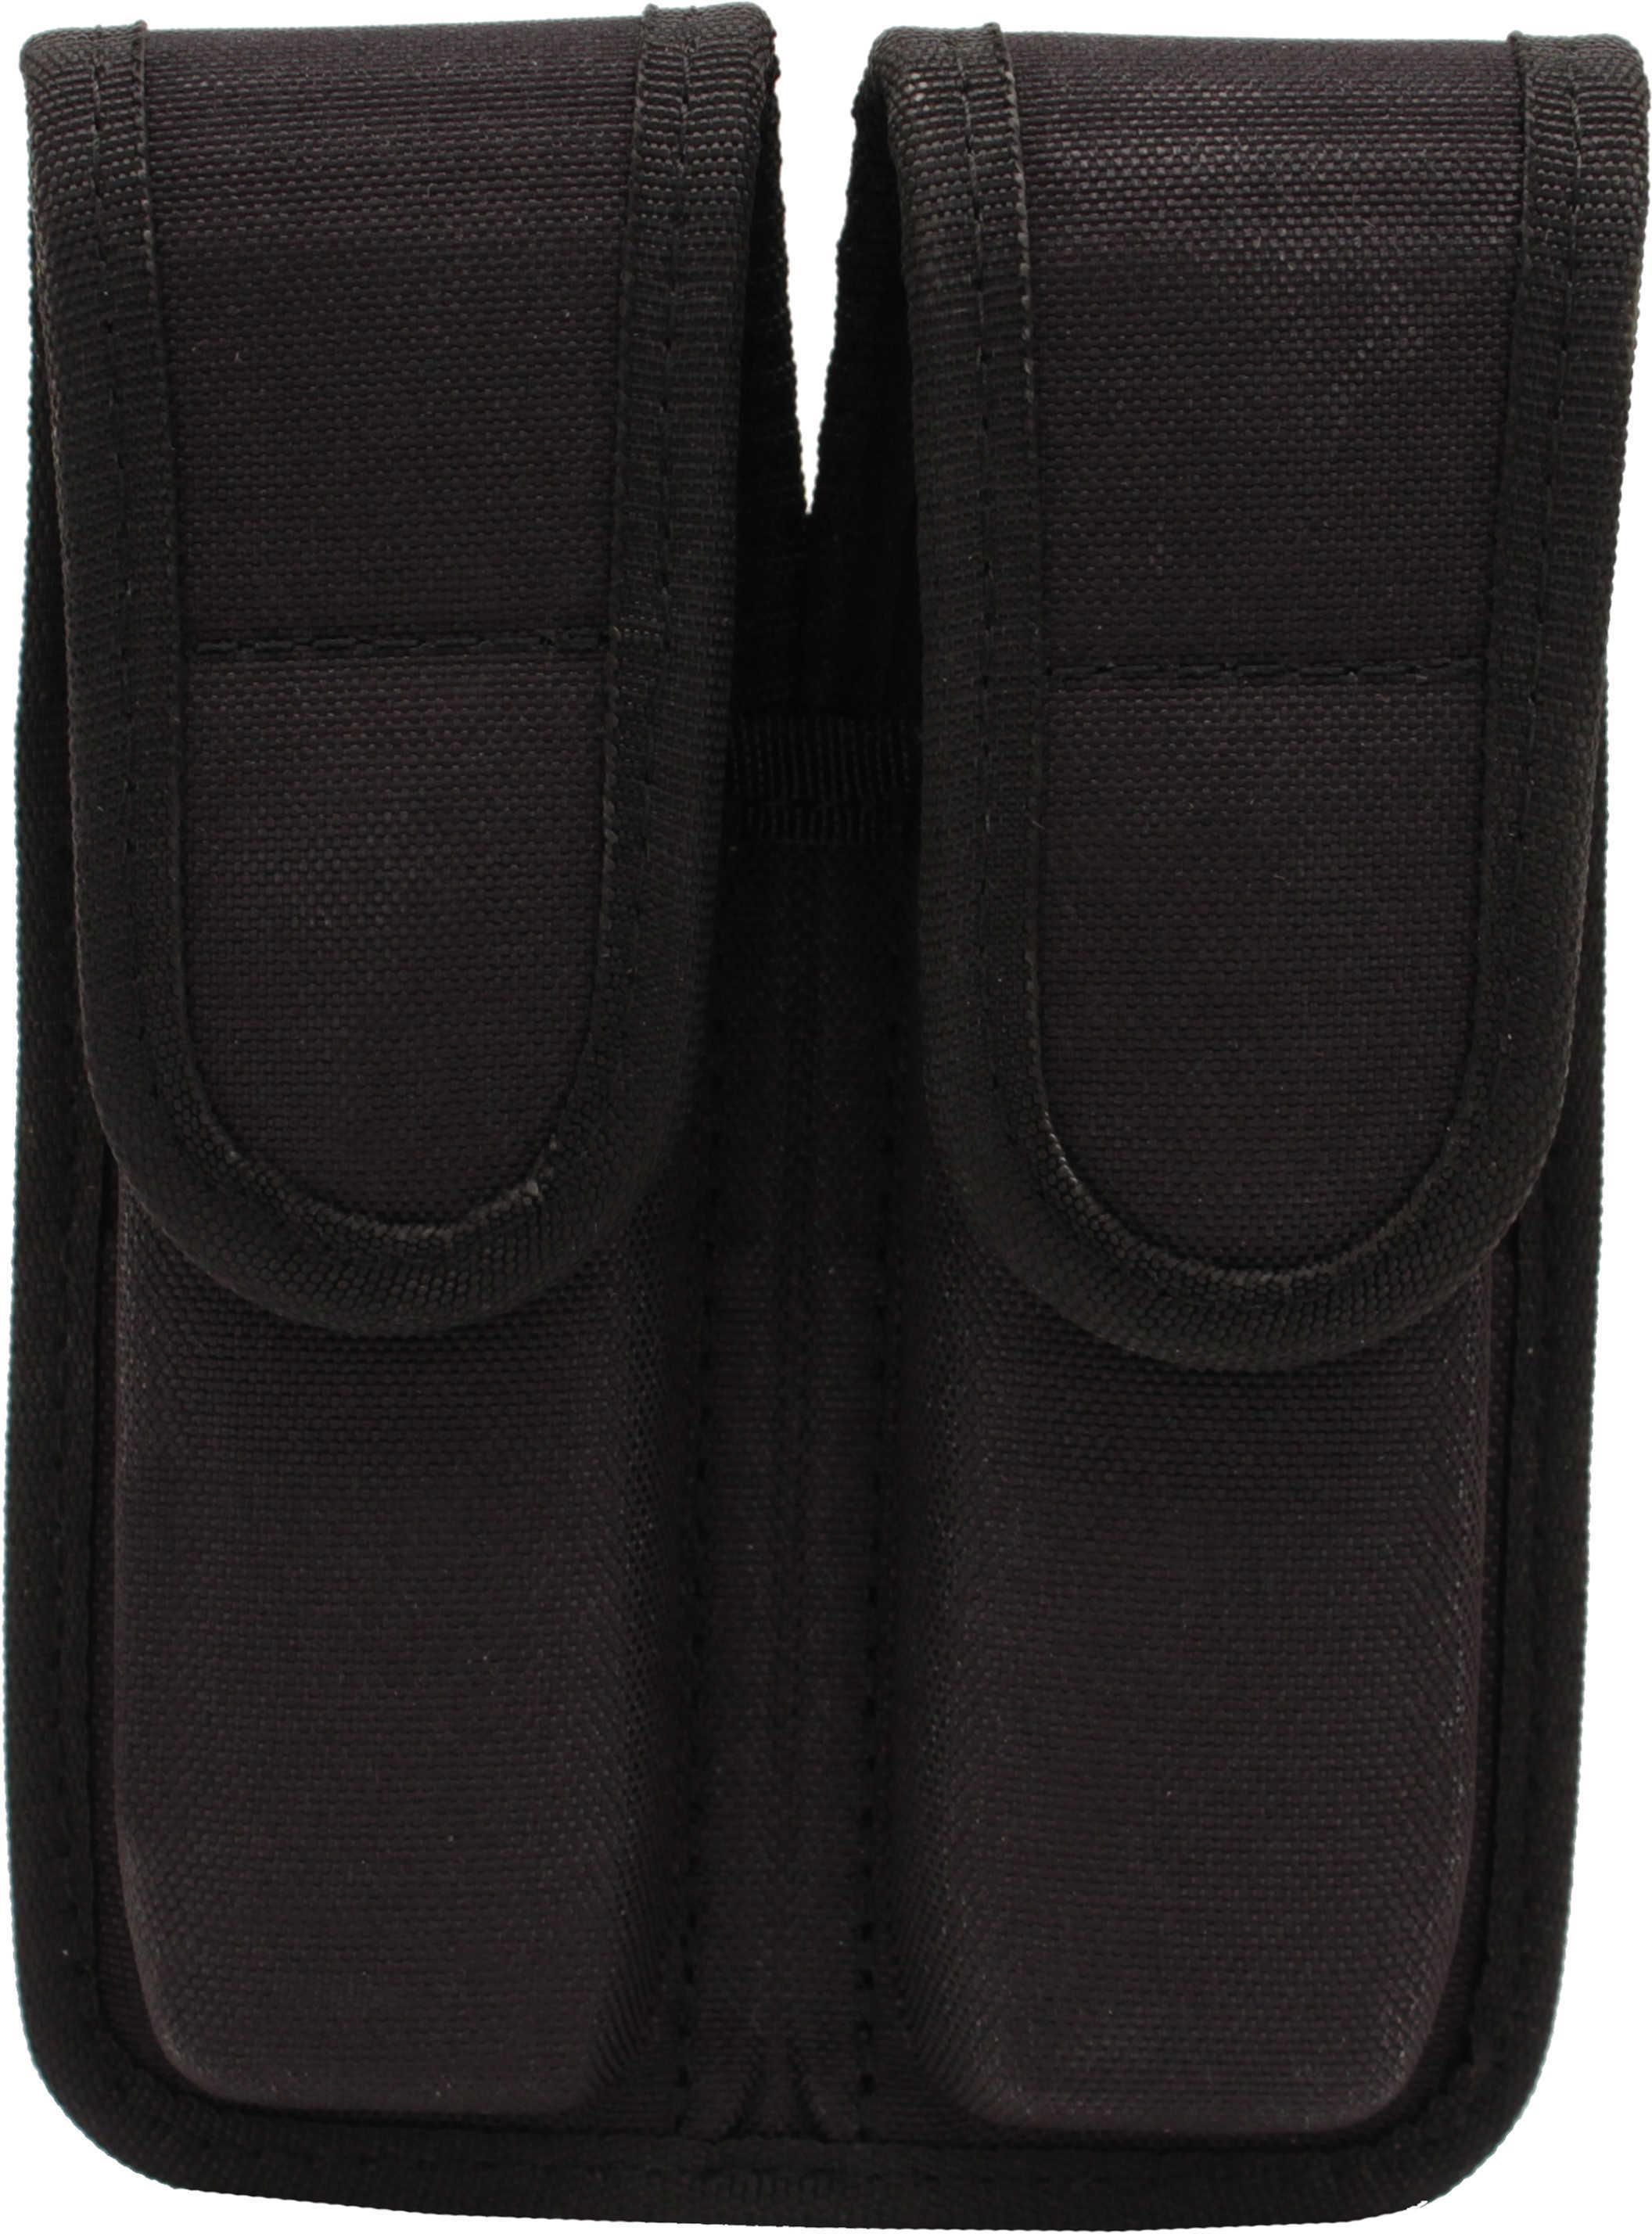 Bianchi 8002 Double Magazine Pouch Black, Size 01 Md: 31301